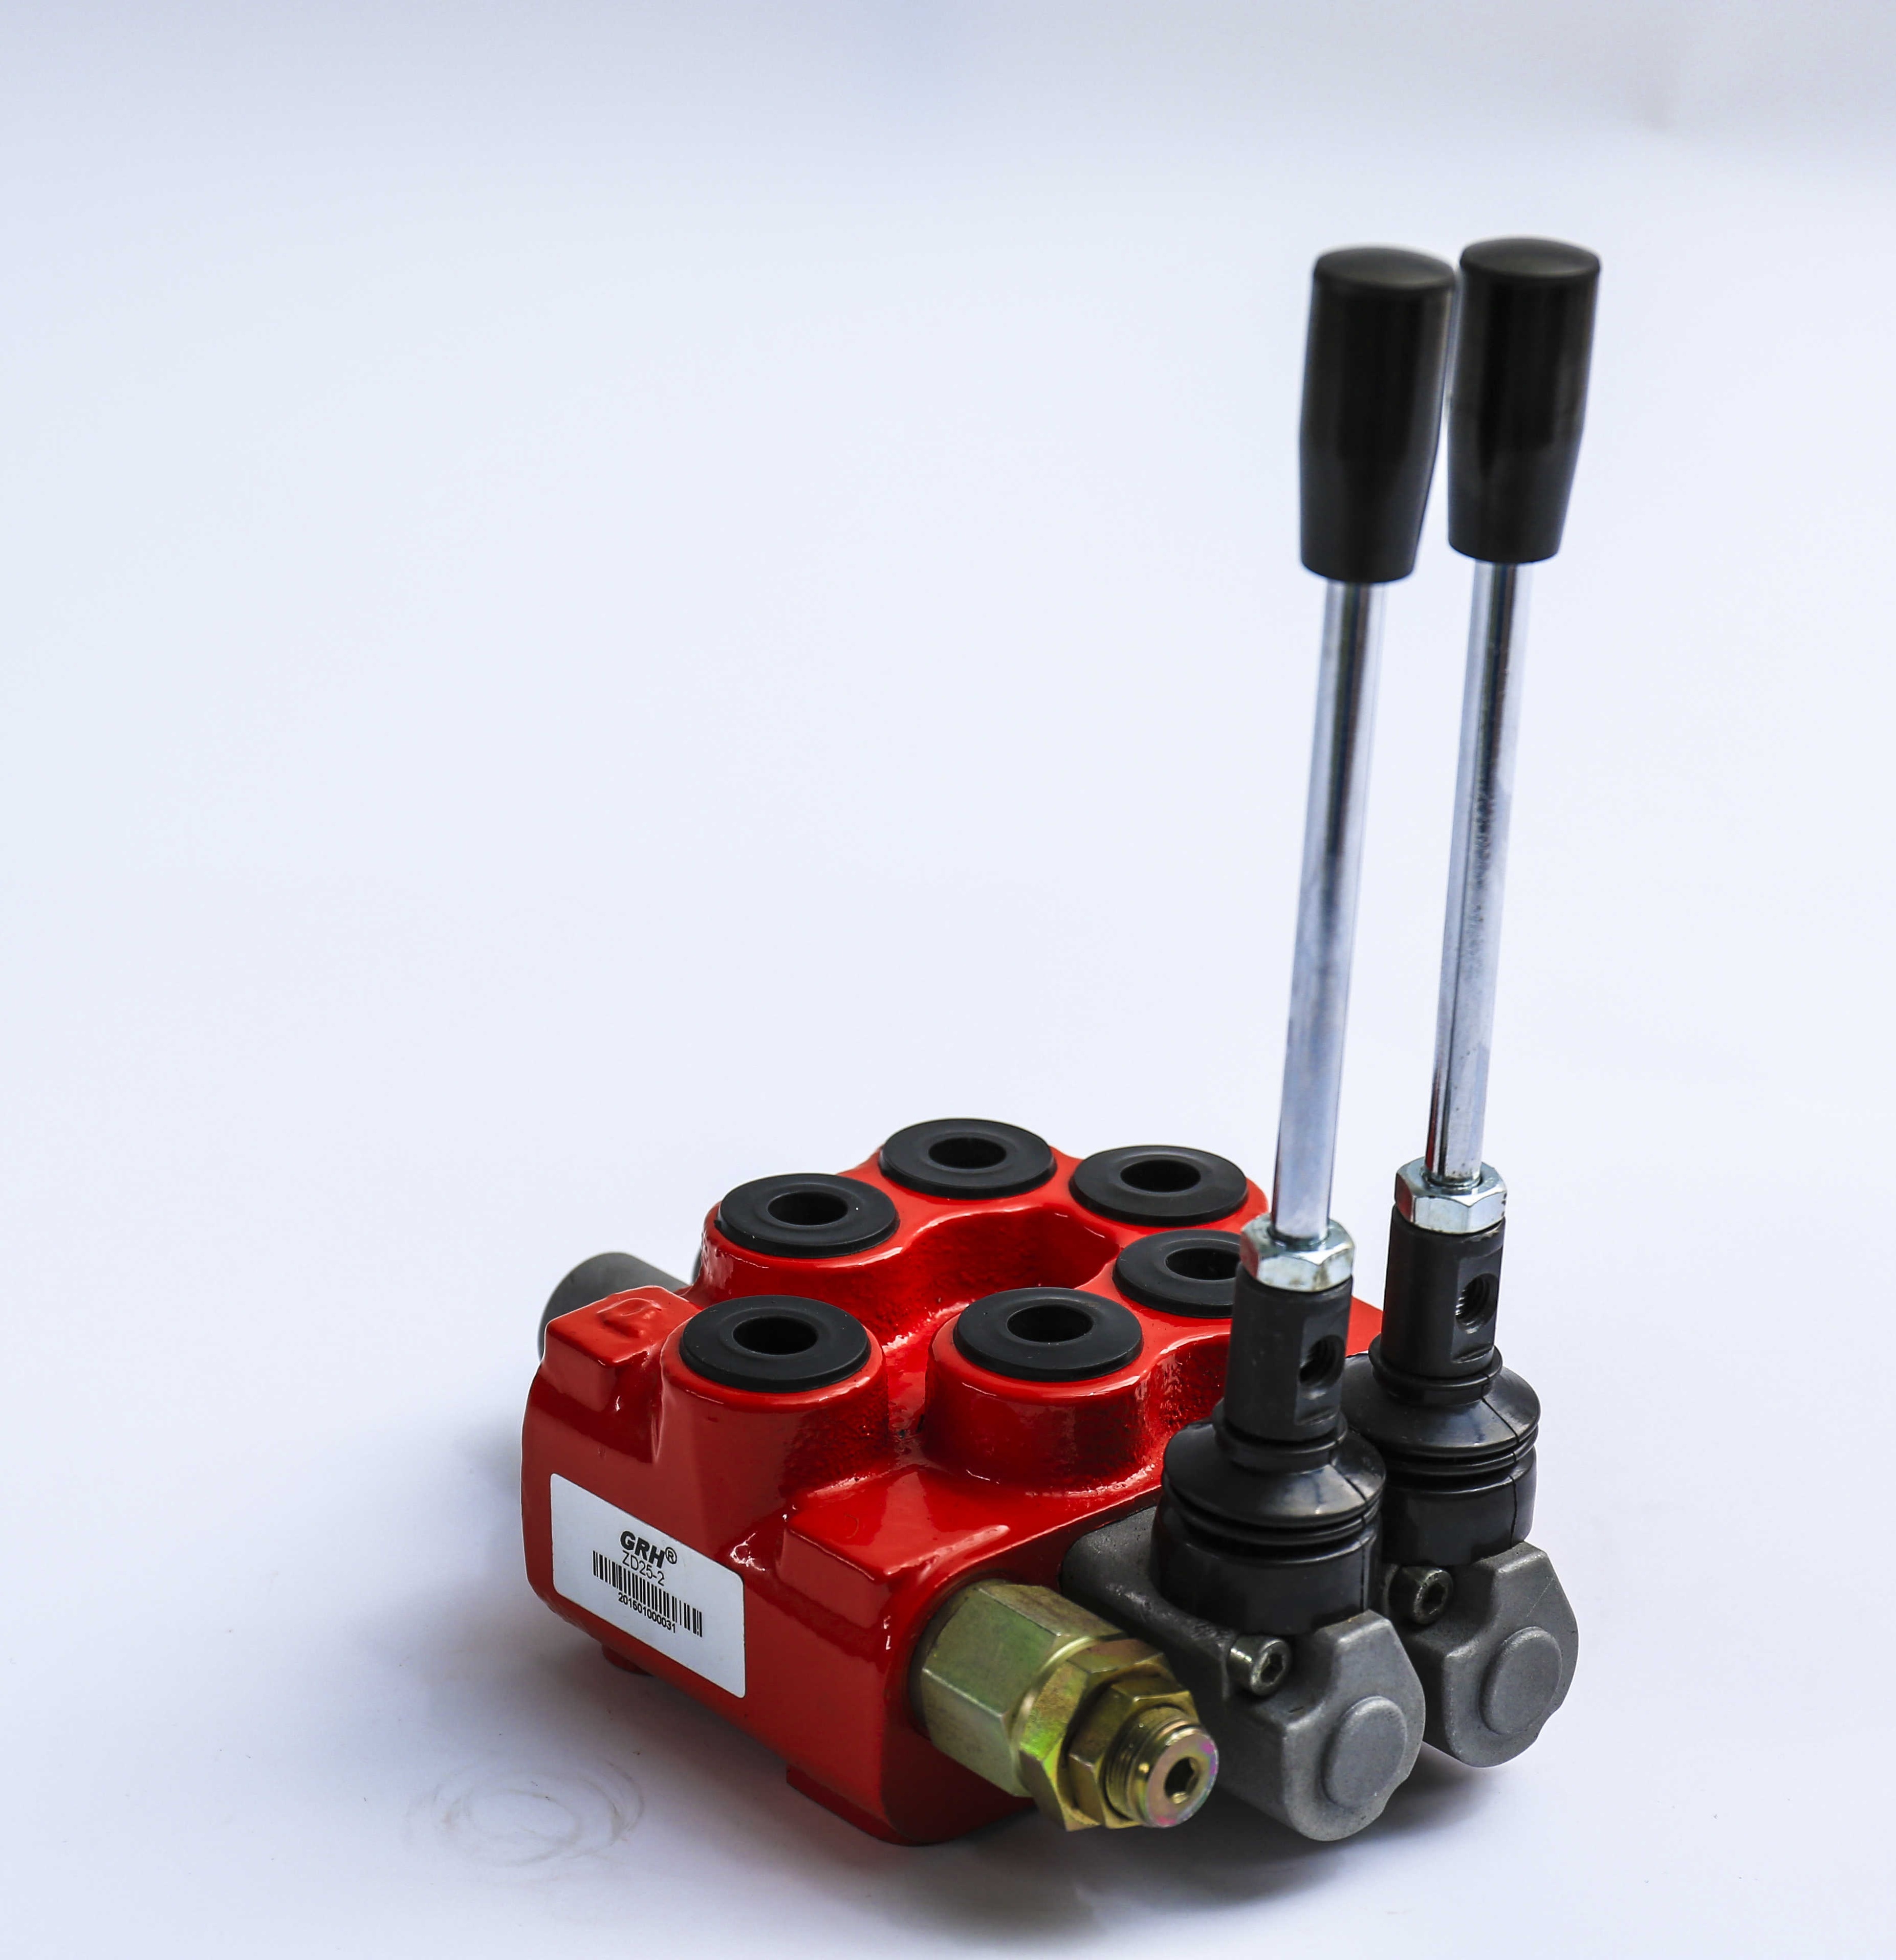 GDV45-5 hydraulic monoblock valve manual control